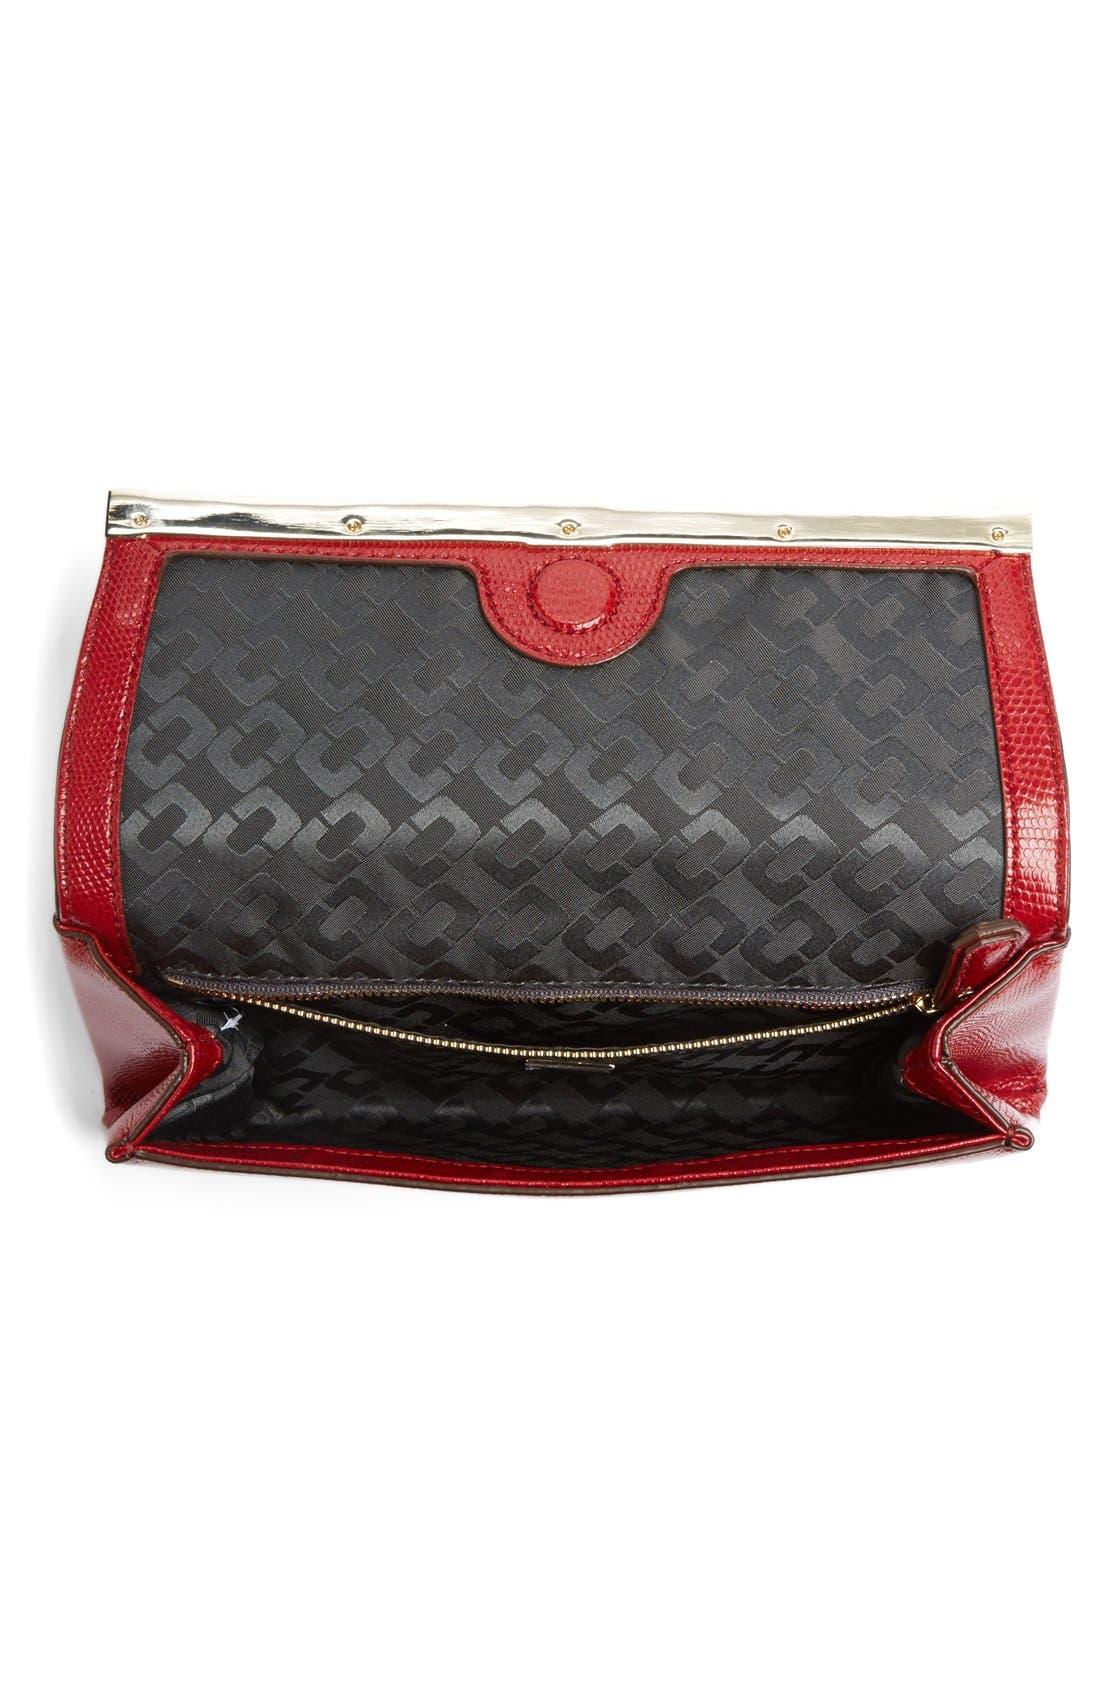 Alternate Image 3  - Diane von Furstenberg '440' Embossed Leather Envelope Clutch